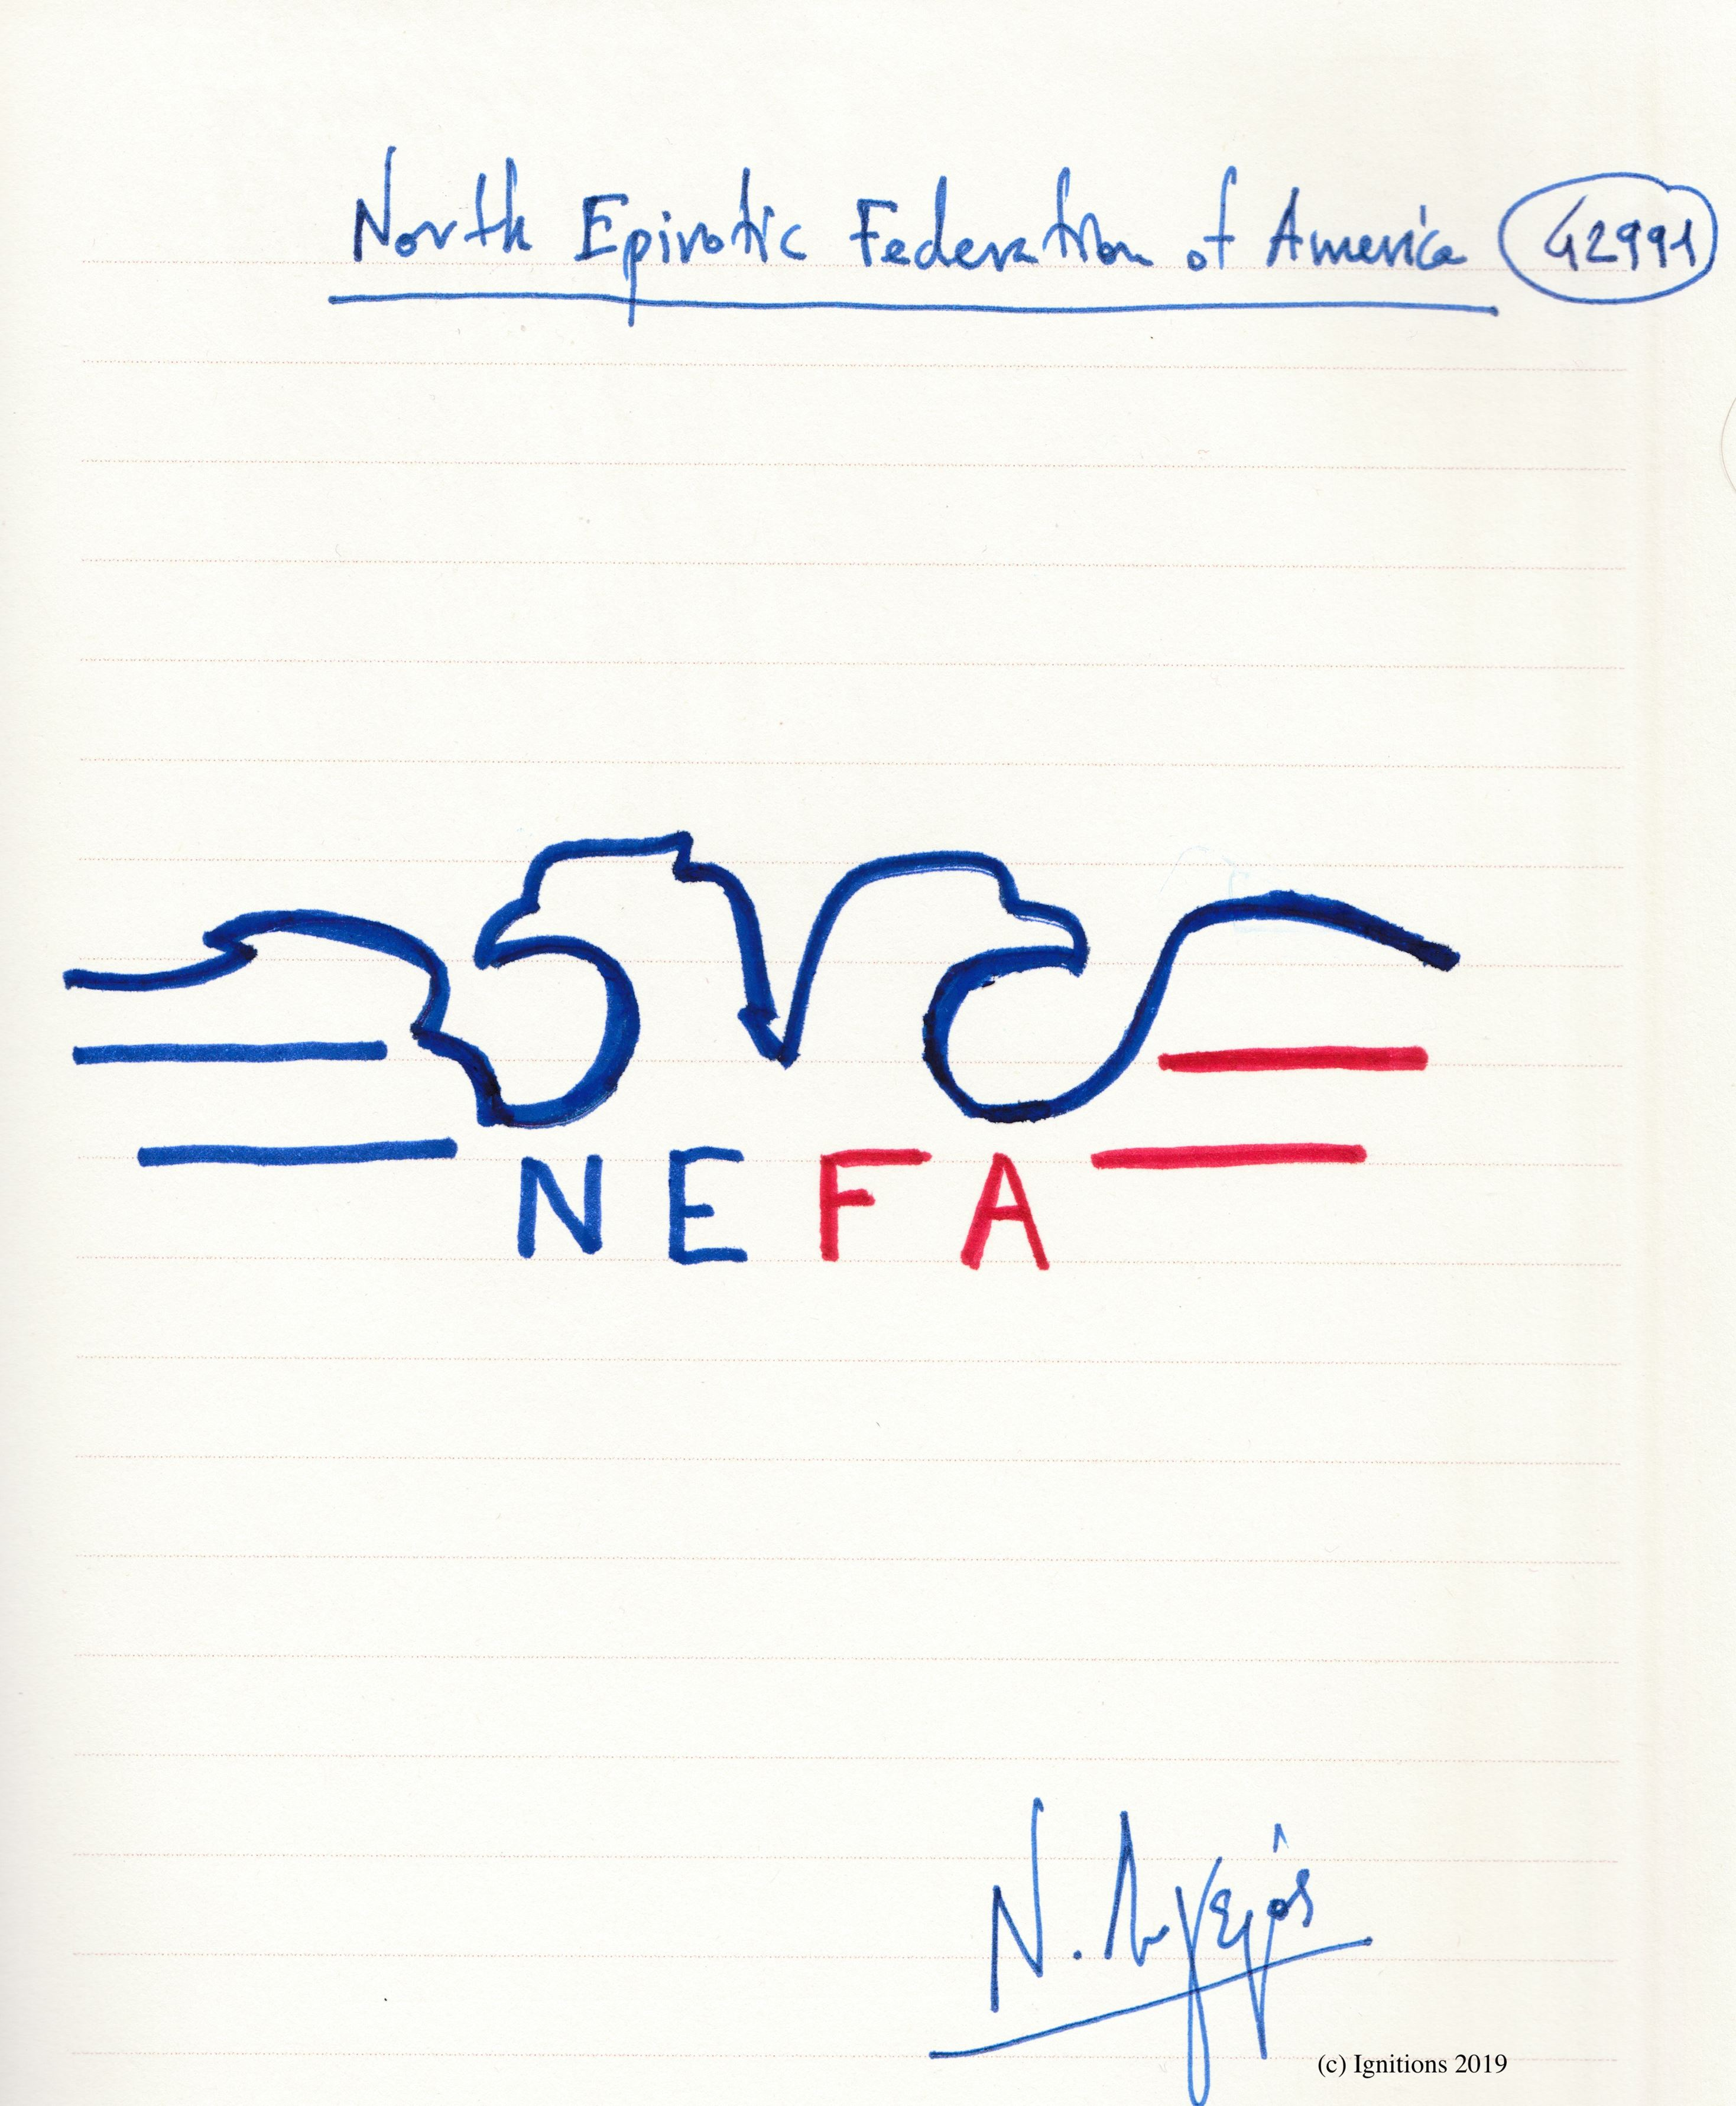 North Epirotic Federation of America. (Dessin)